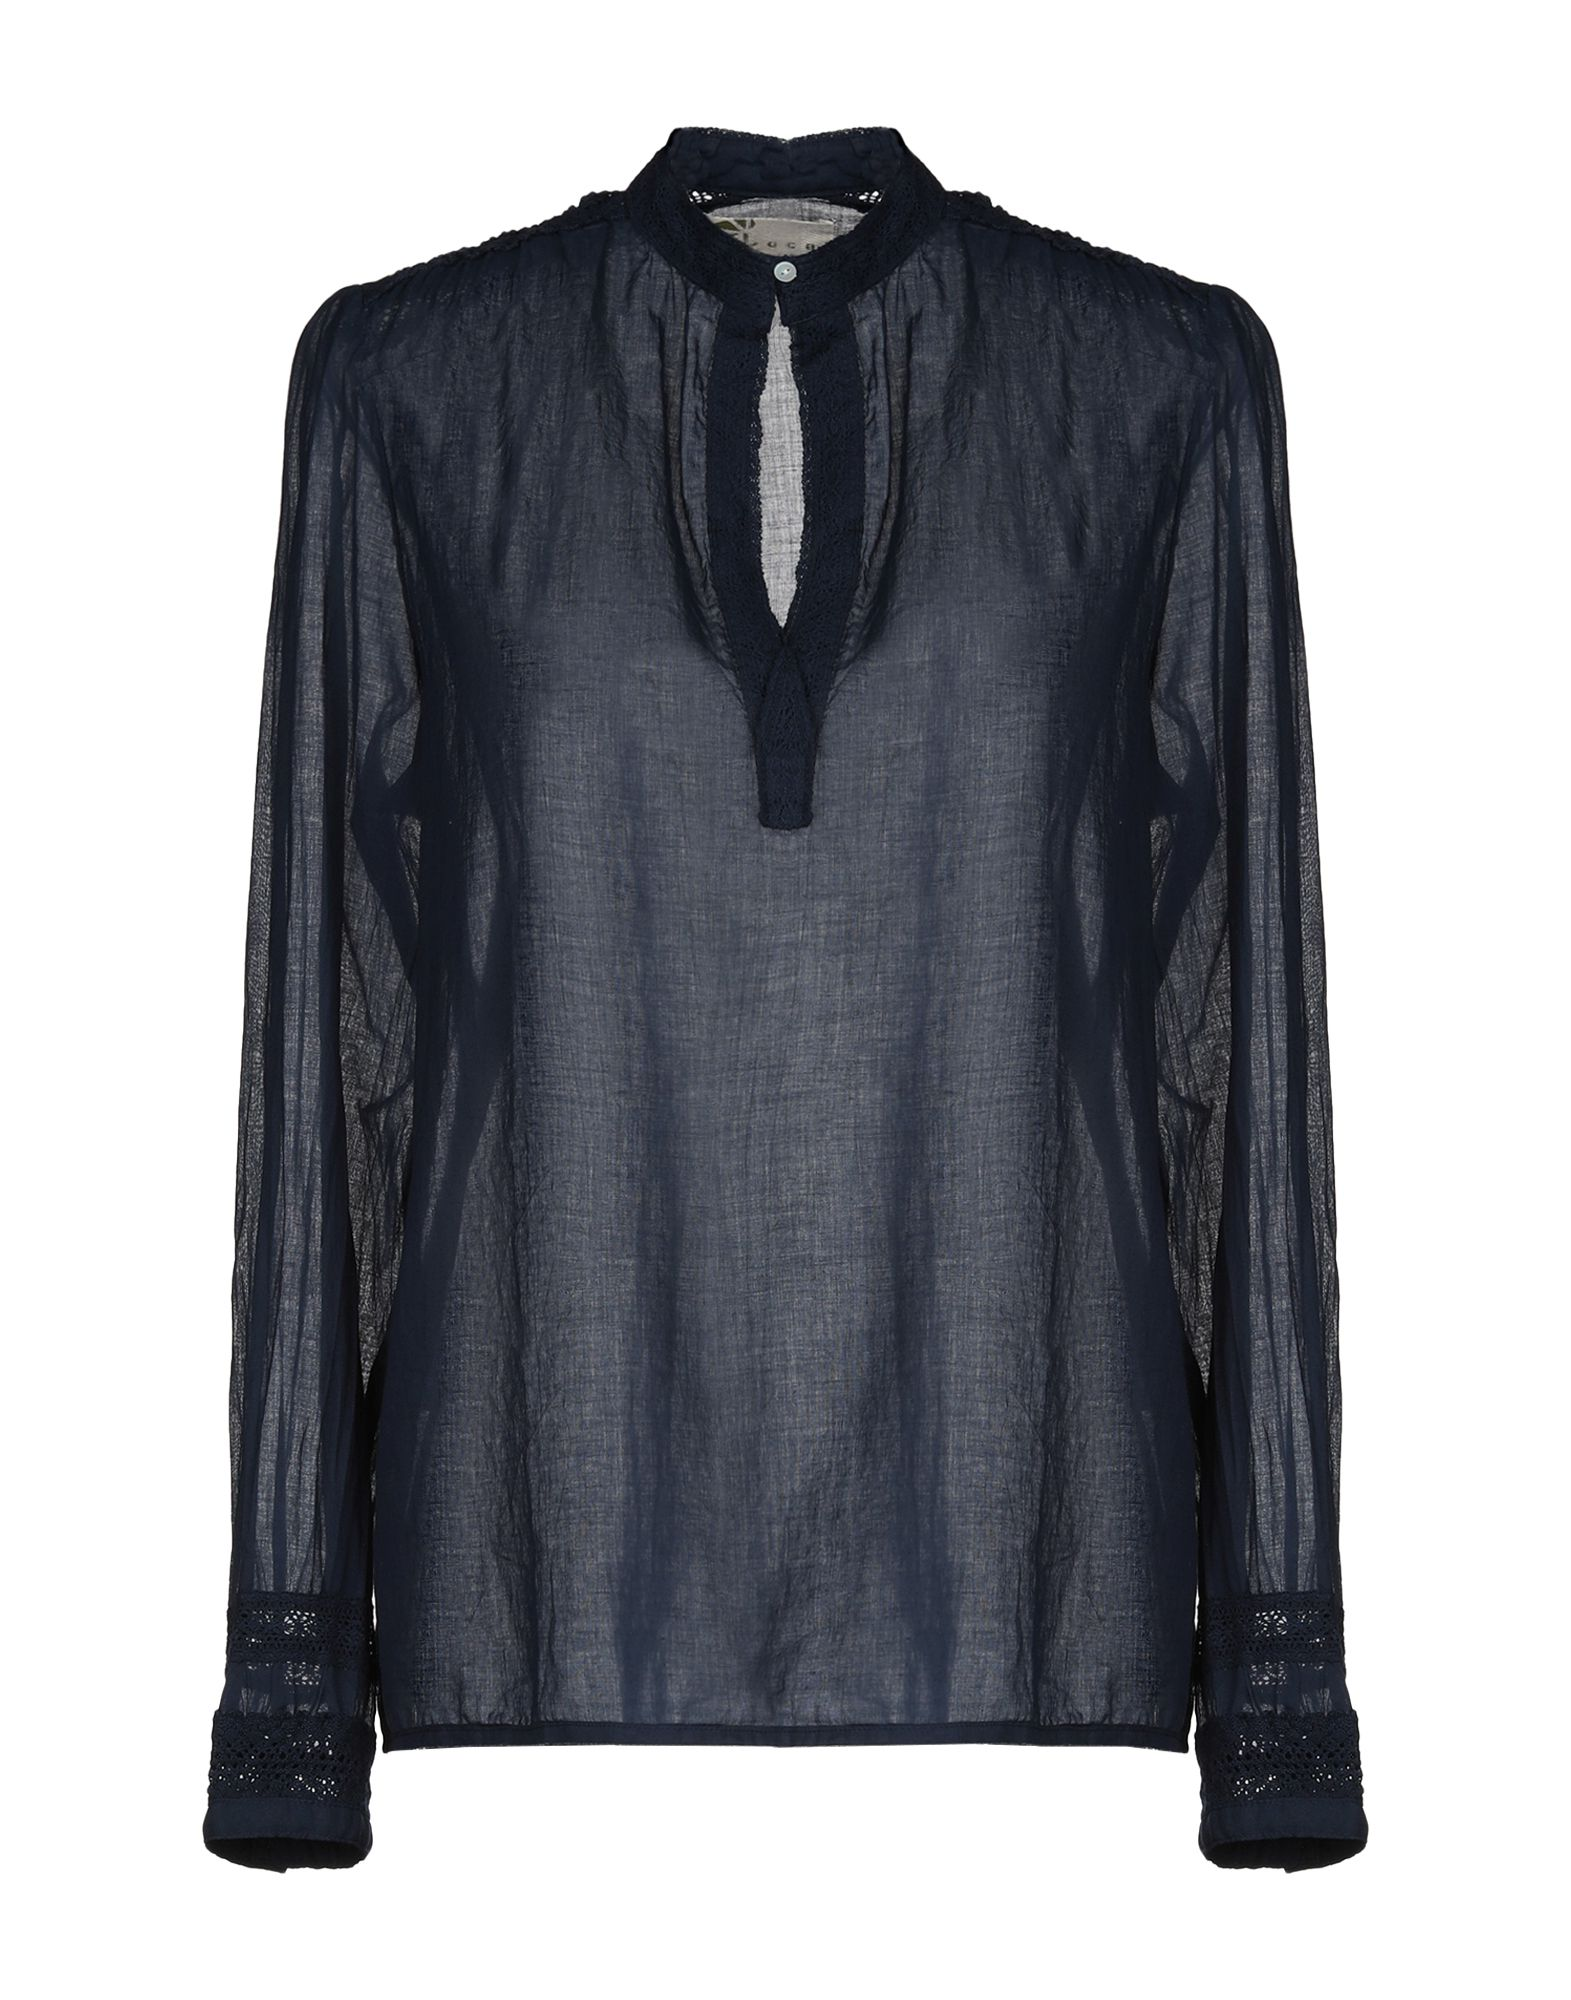 LOCAL APPAREL Блузка цены онлайн